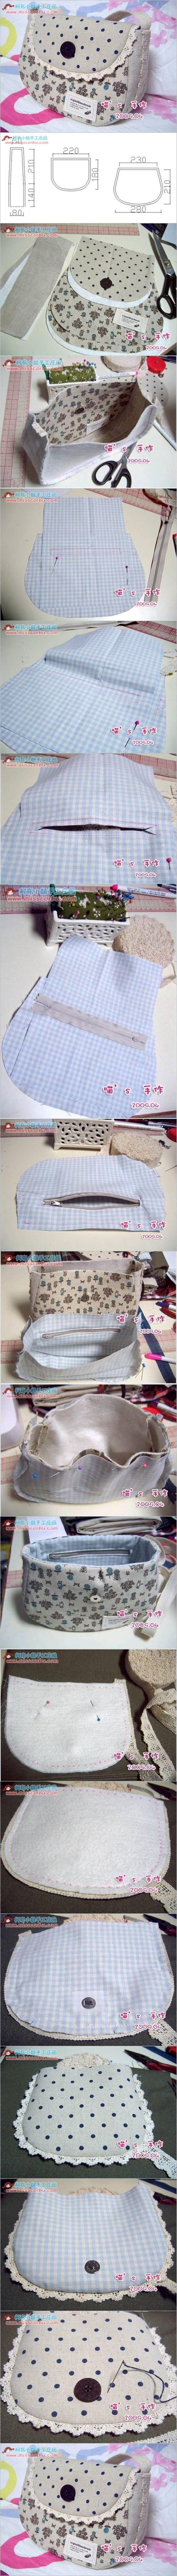 DIY How to Sew a Simple Summer Handbag ...♥ Deniz ♥